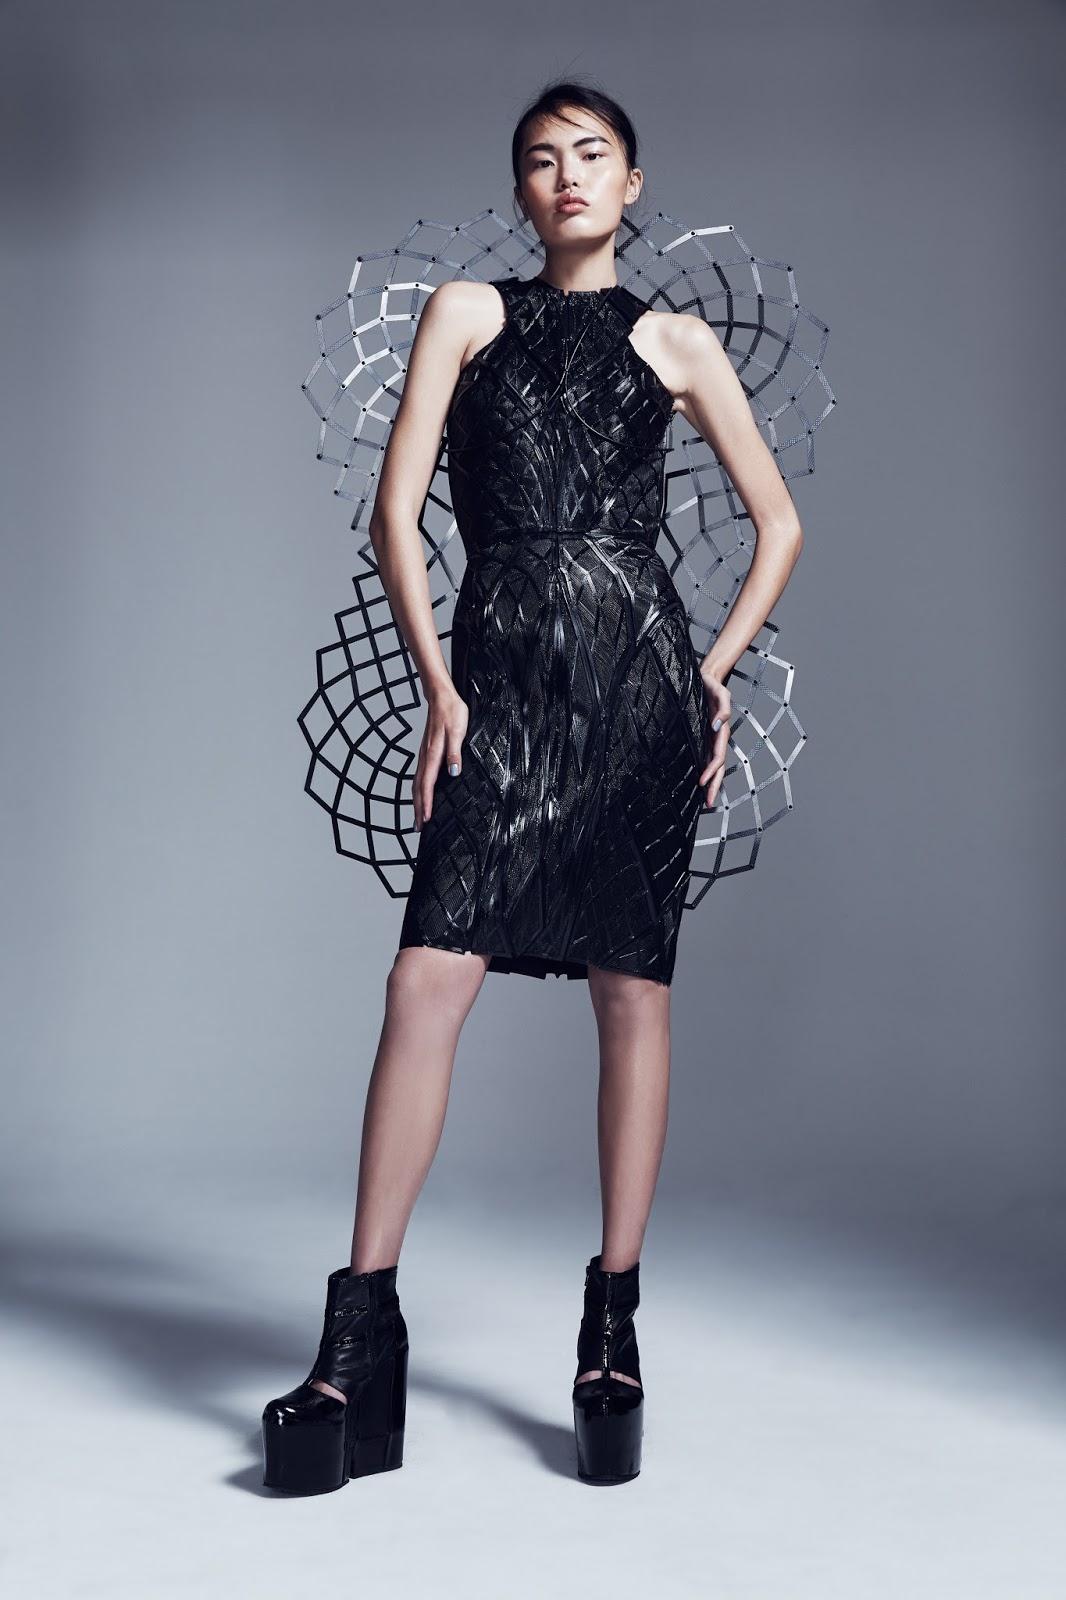 vestido-adrenaline-1.jpg